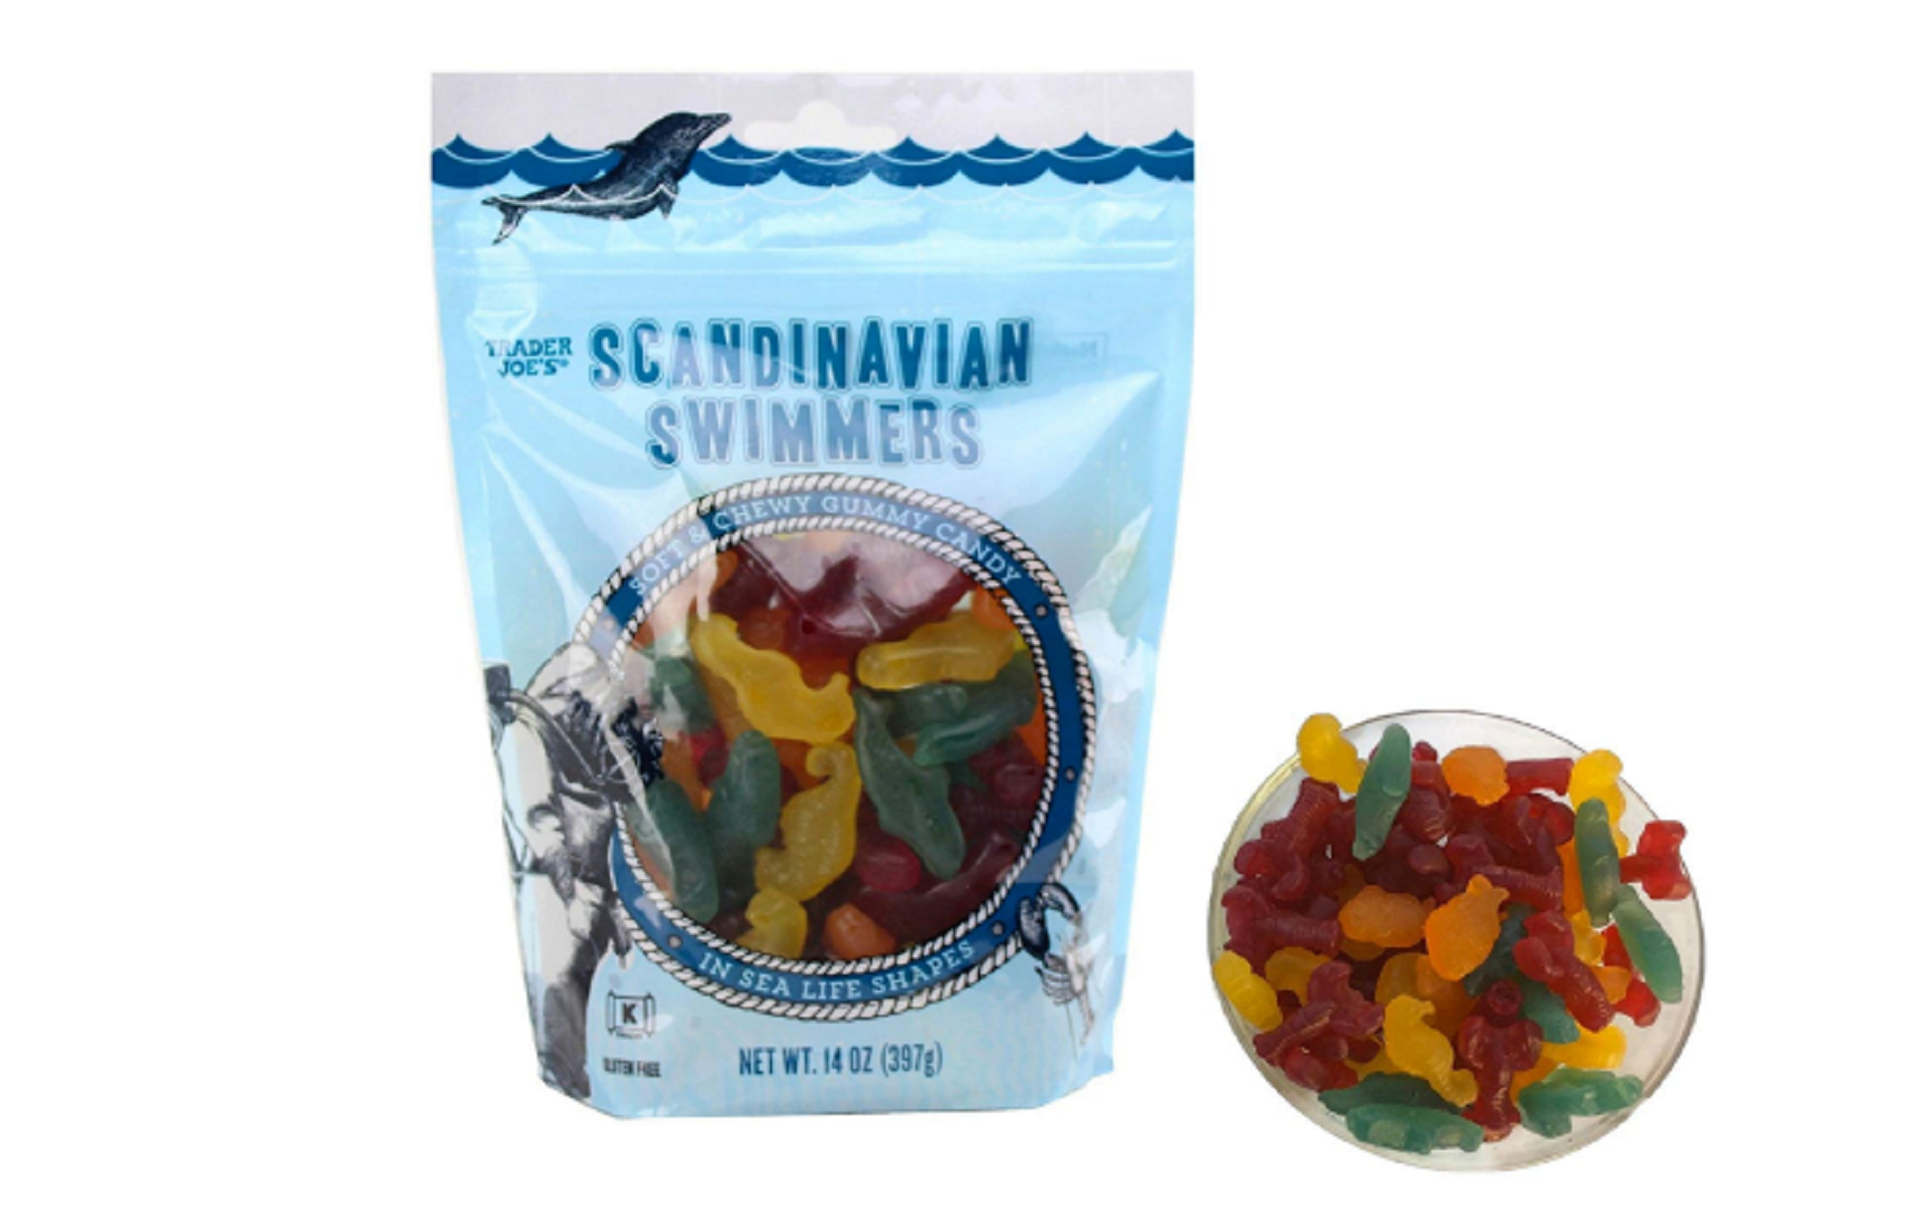 trader joe's scandinavian swimmers